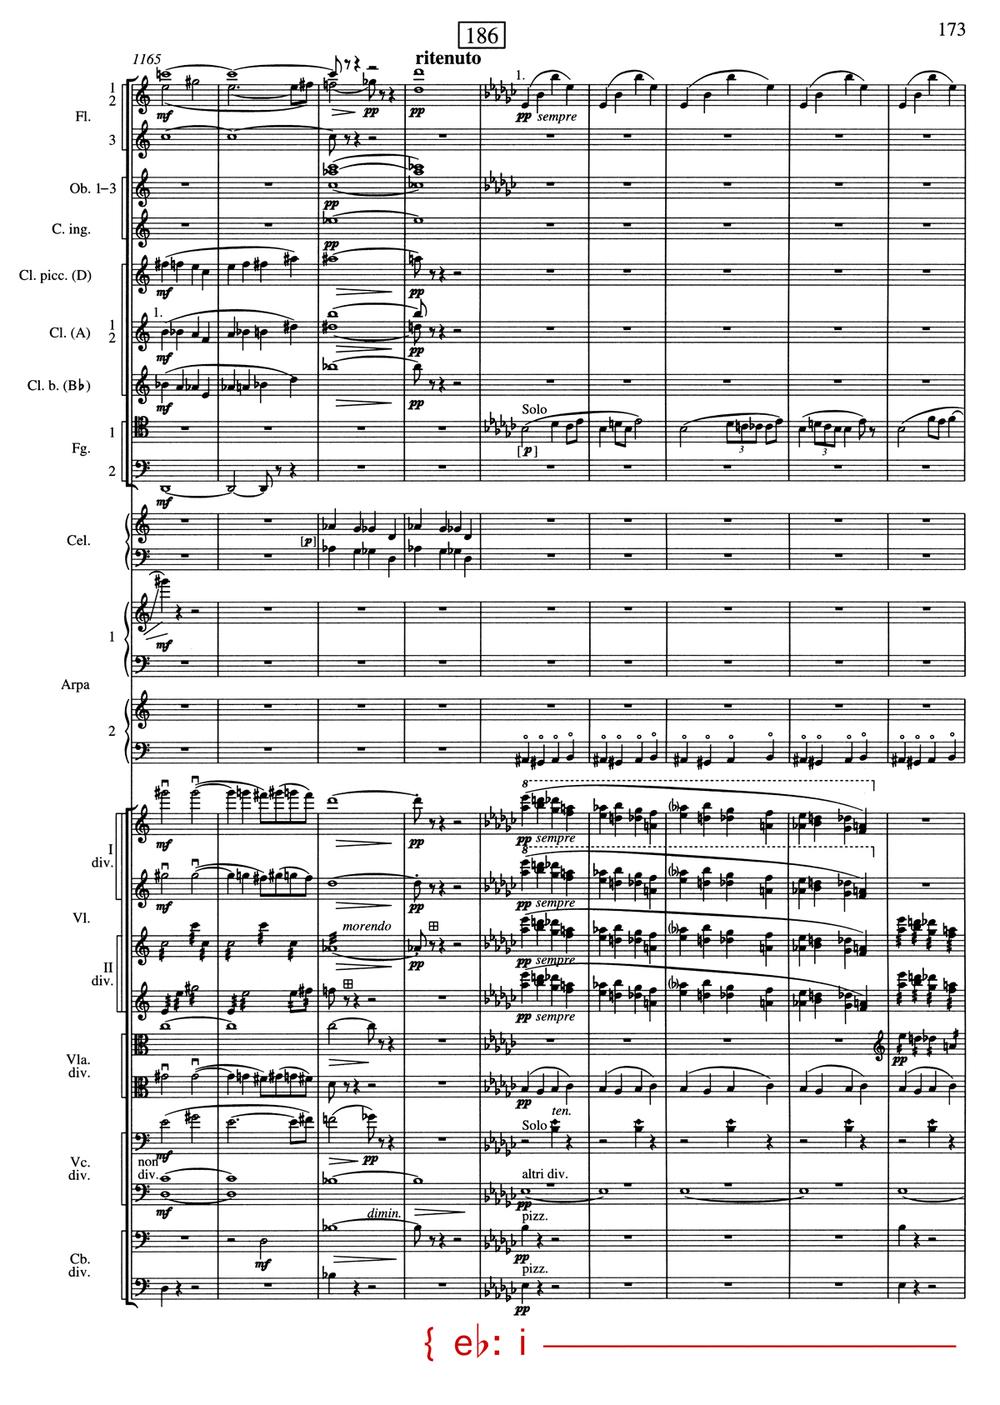 Stravinsky_Firebird_Theory_3.jpg